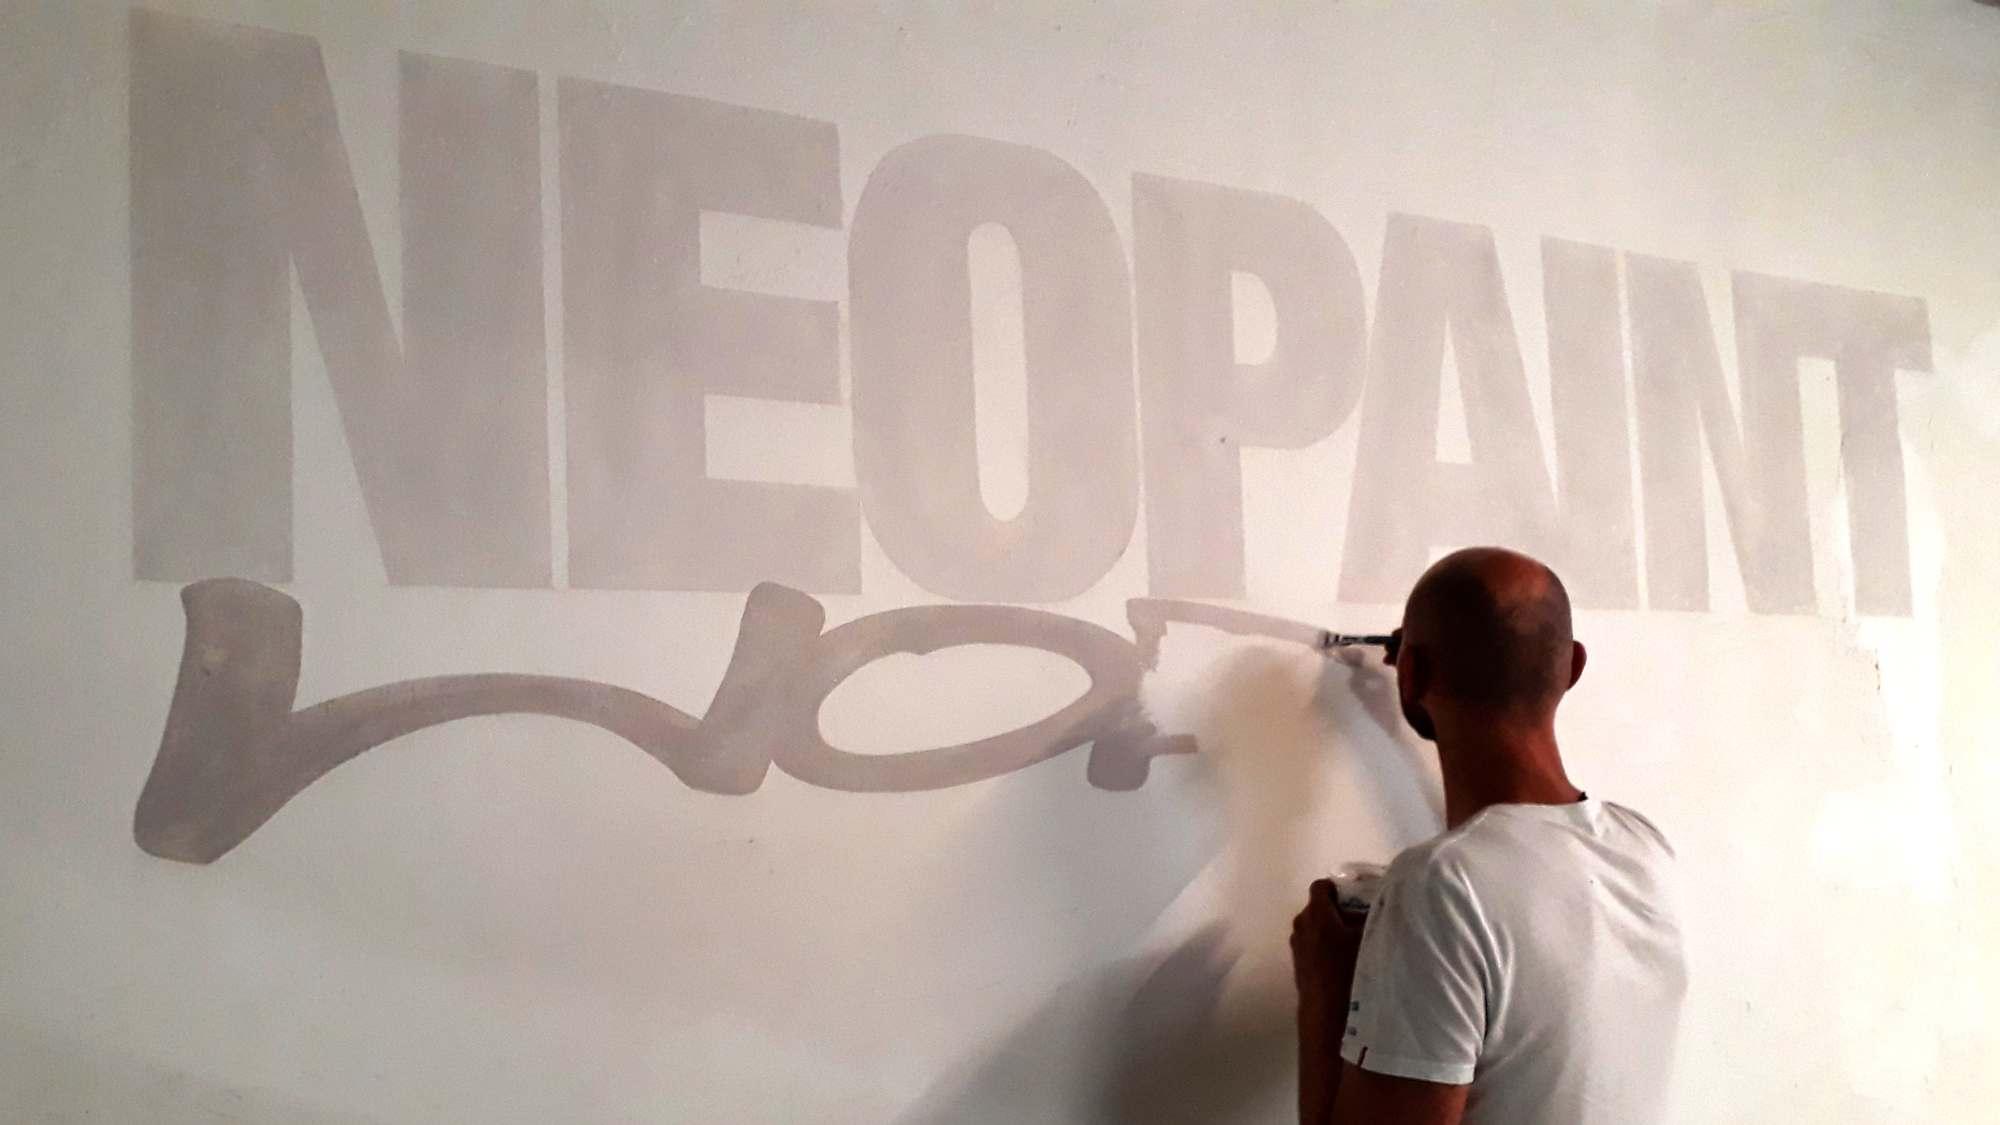 Neopaint - Falfestés